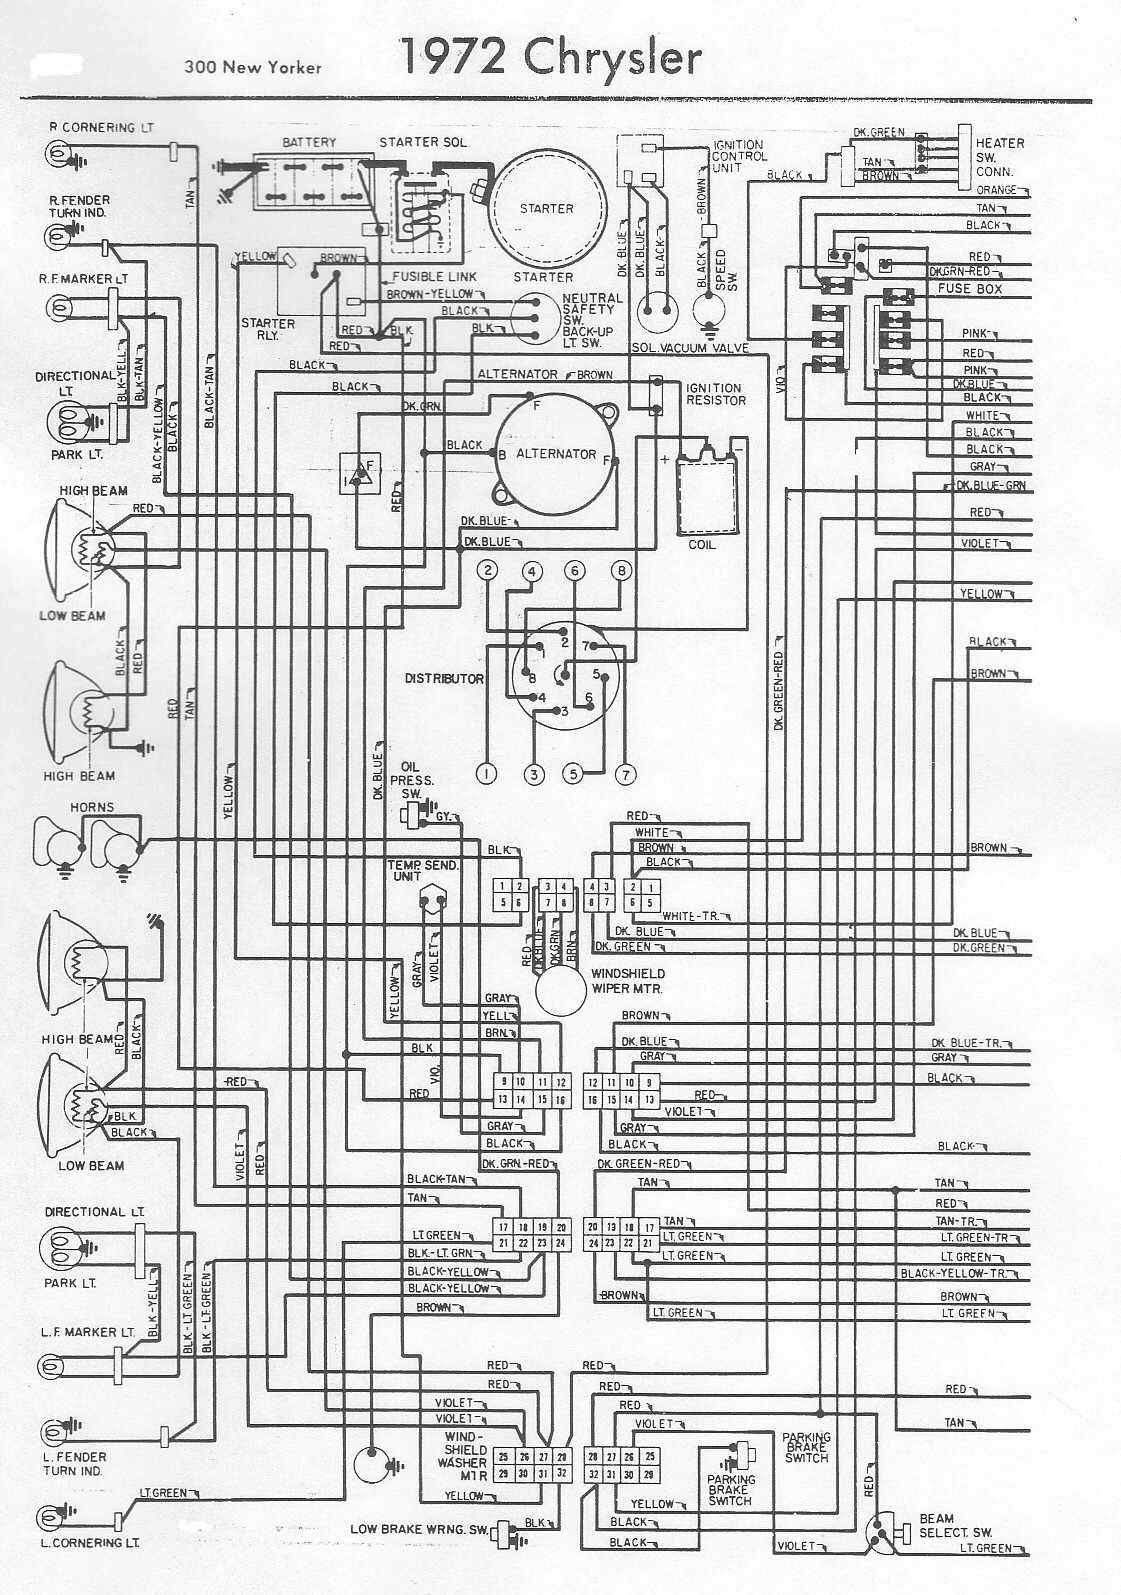 Chrysler 300 Wiring Diagram | Machine Repair Manual on